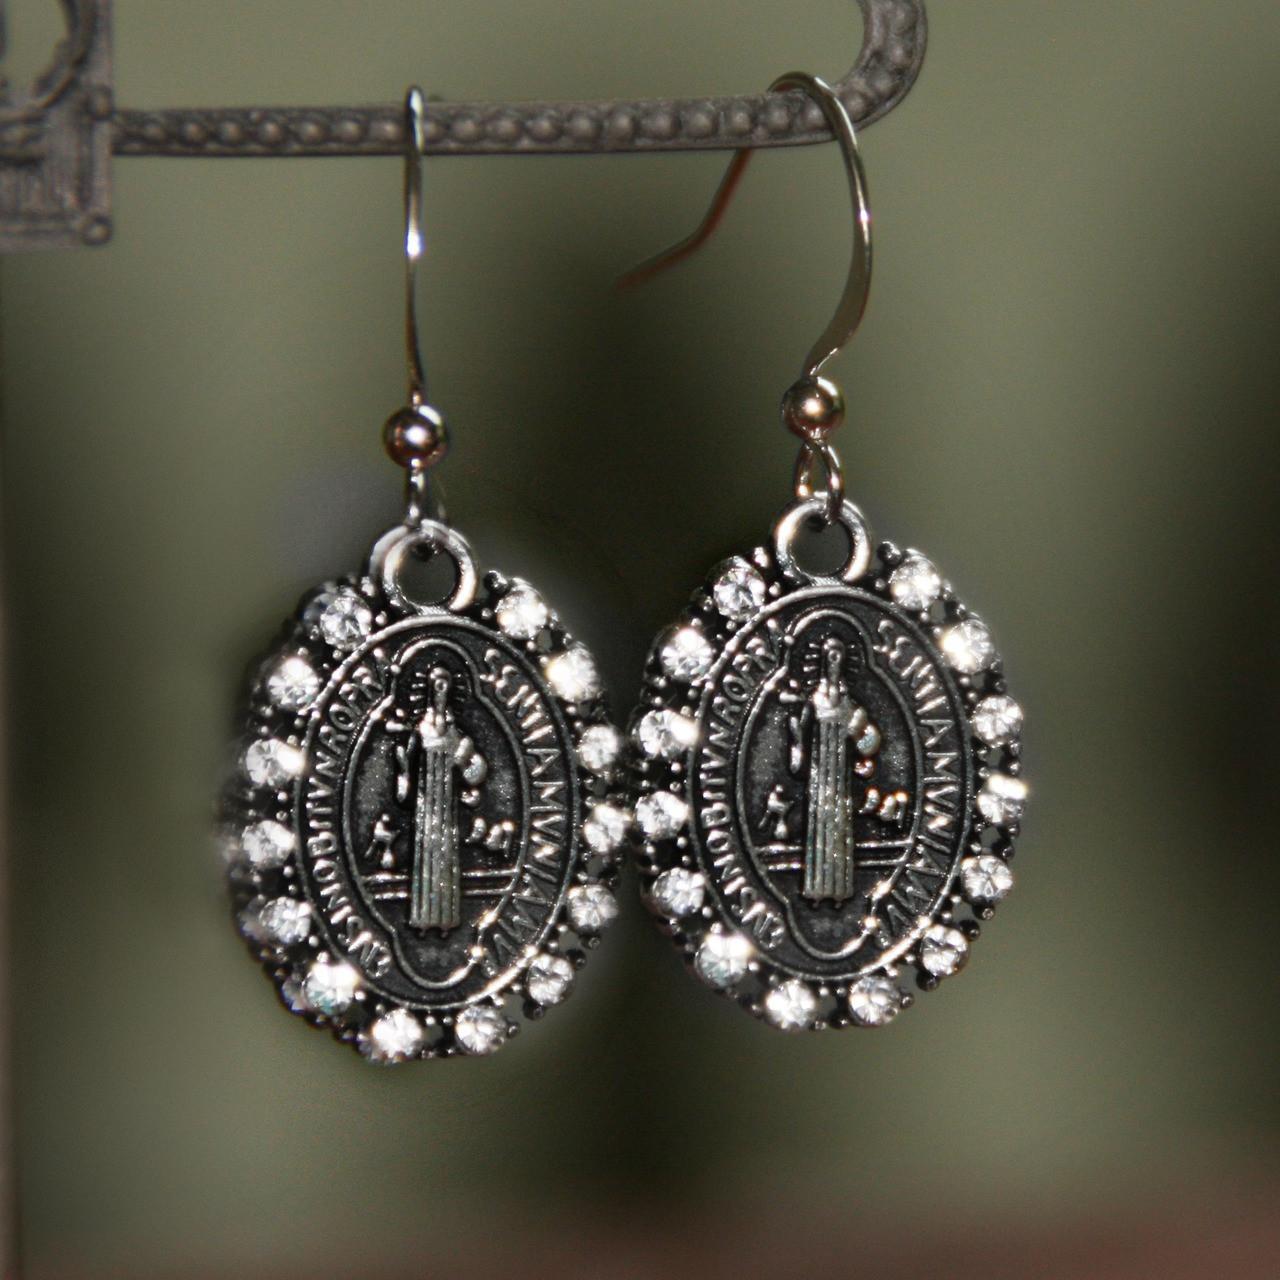 IN-80  St. Benedict Crystal Swarovski Earrings